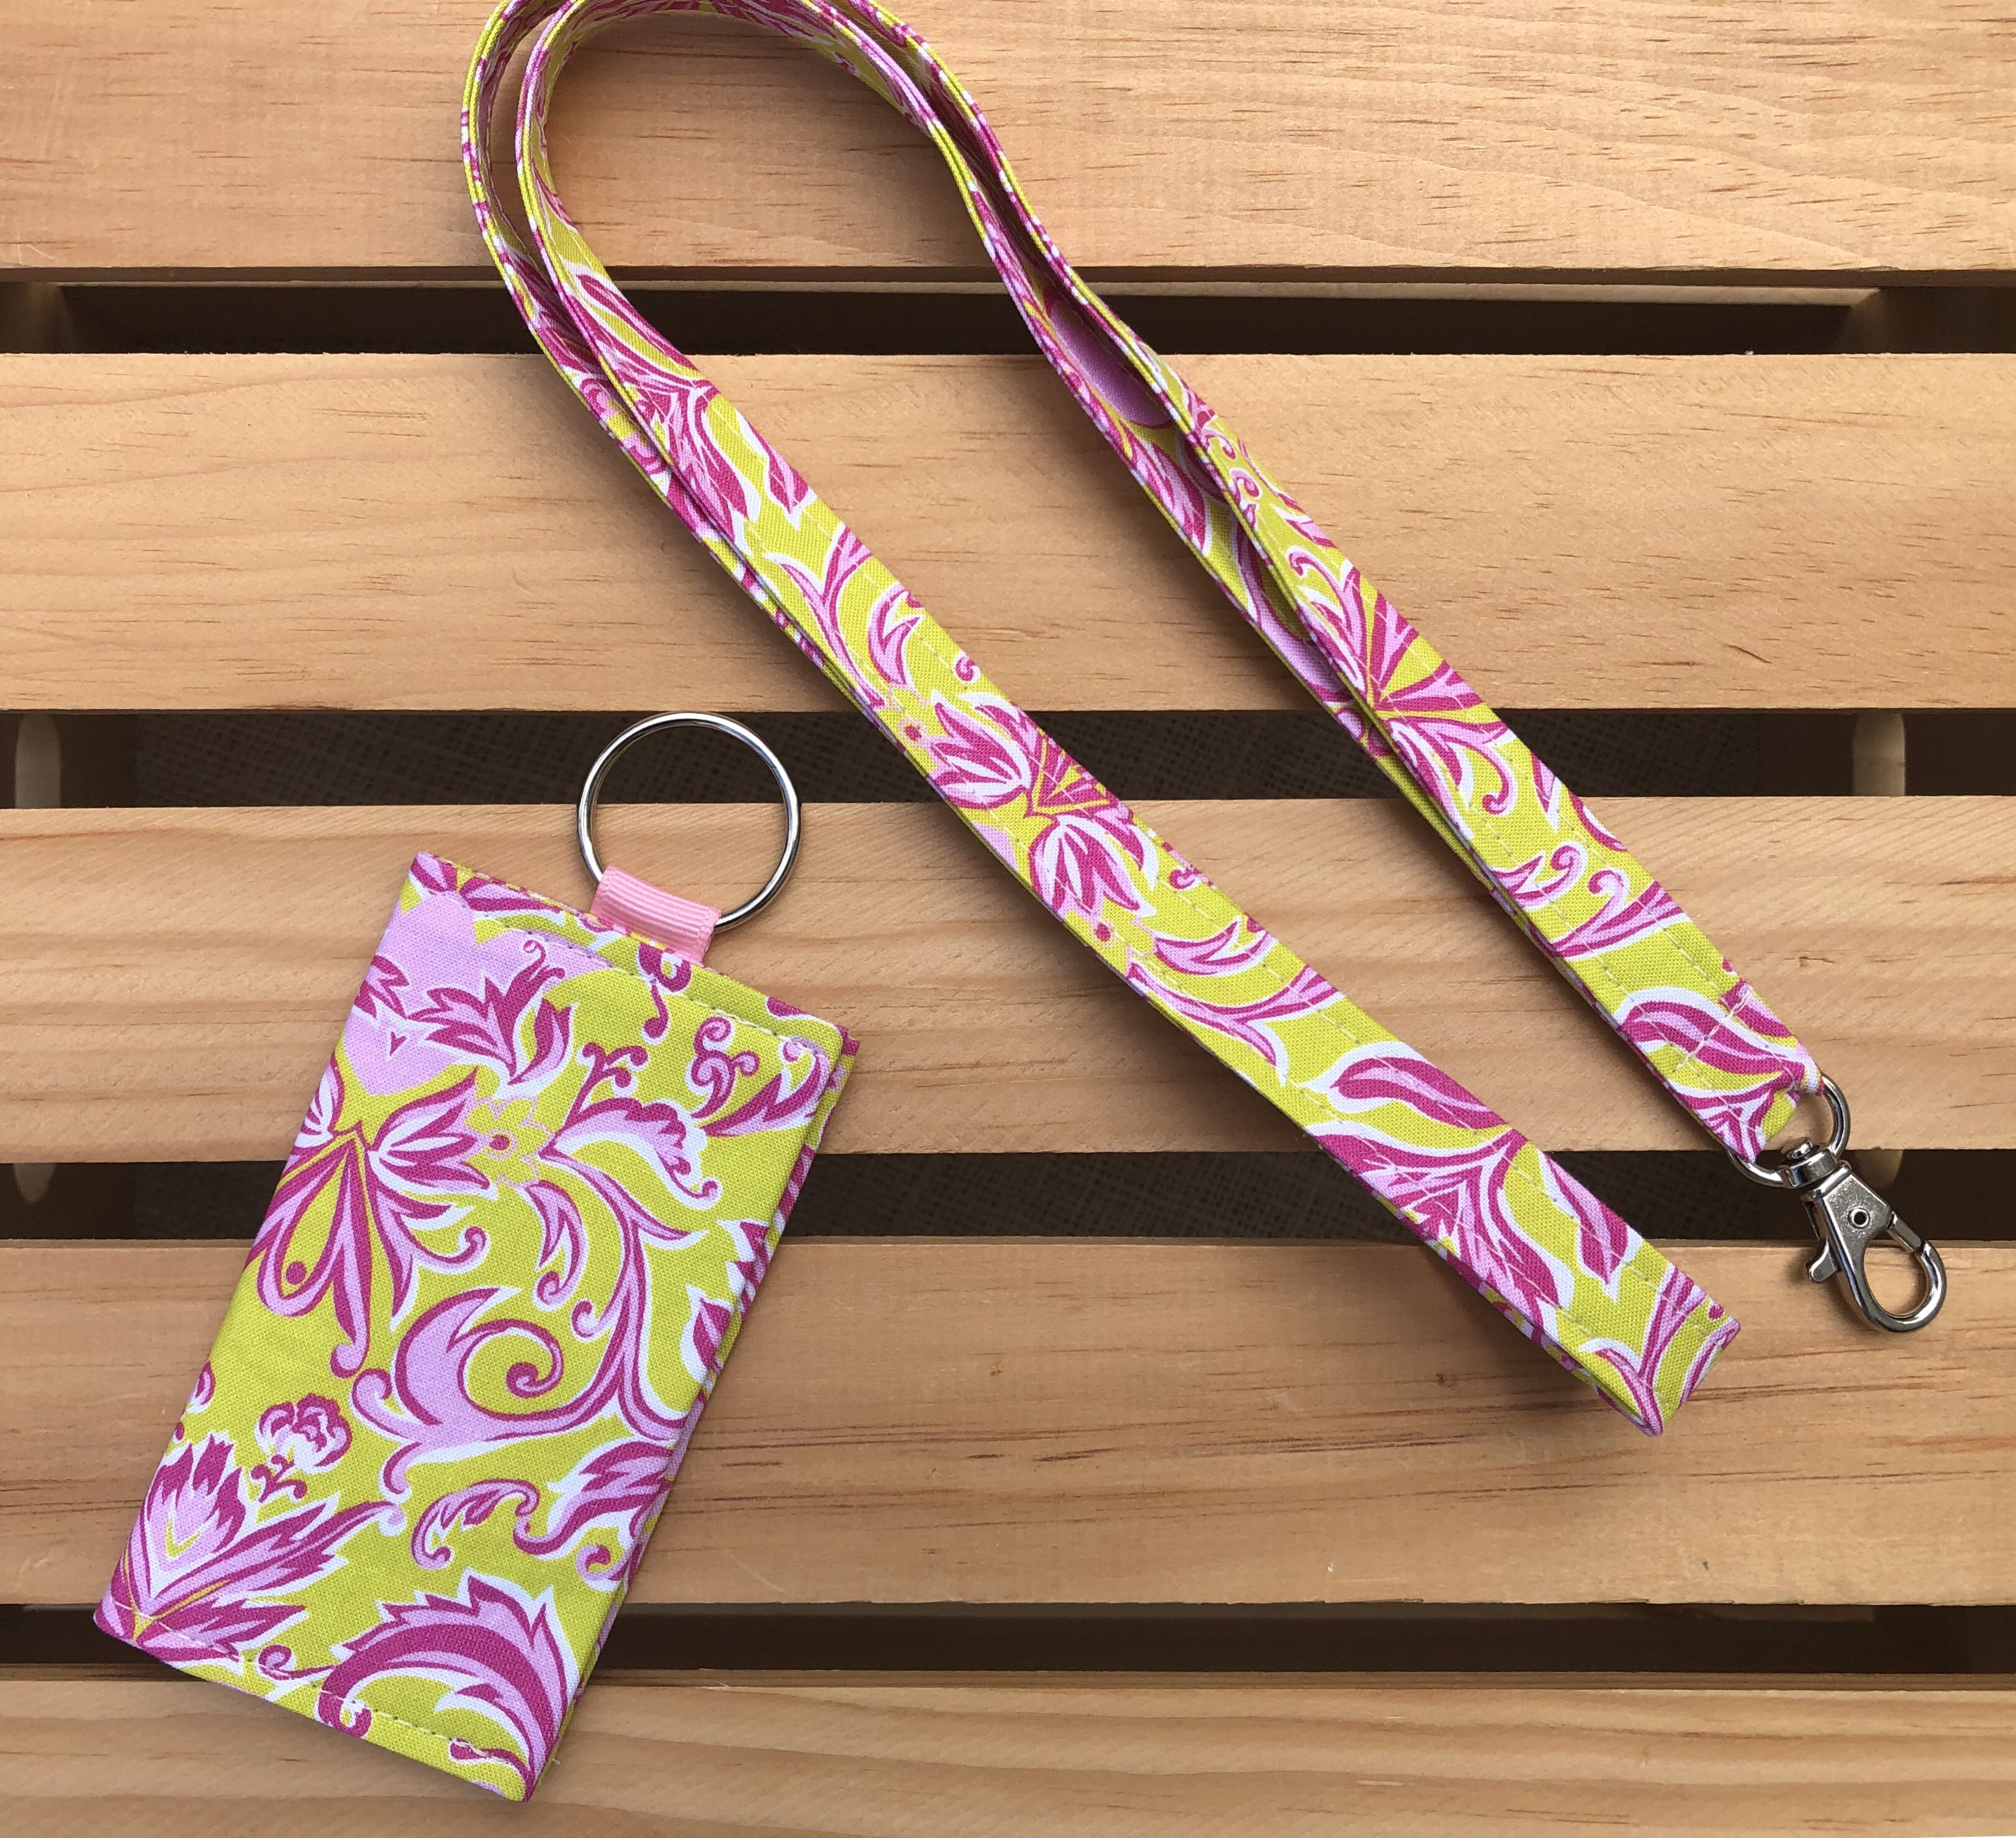 Card holderkeychain lanyard matching keychains gift